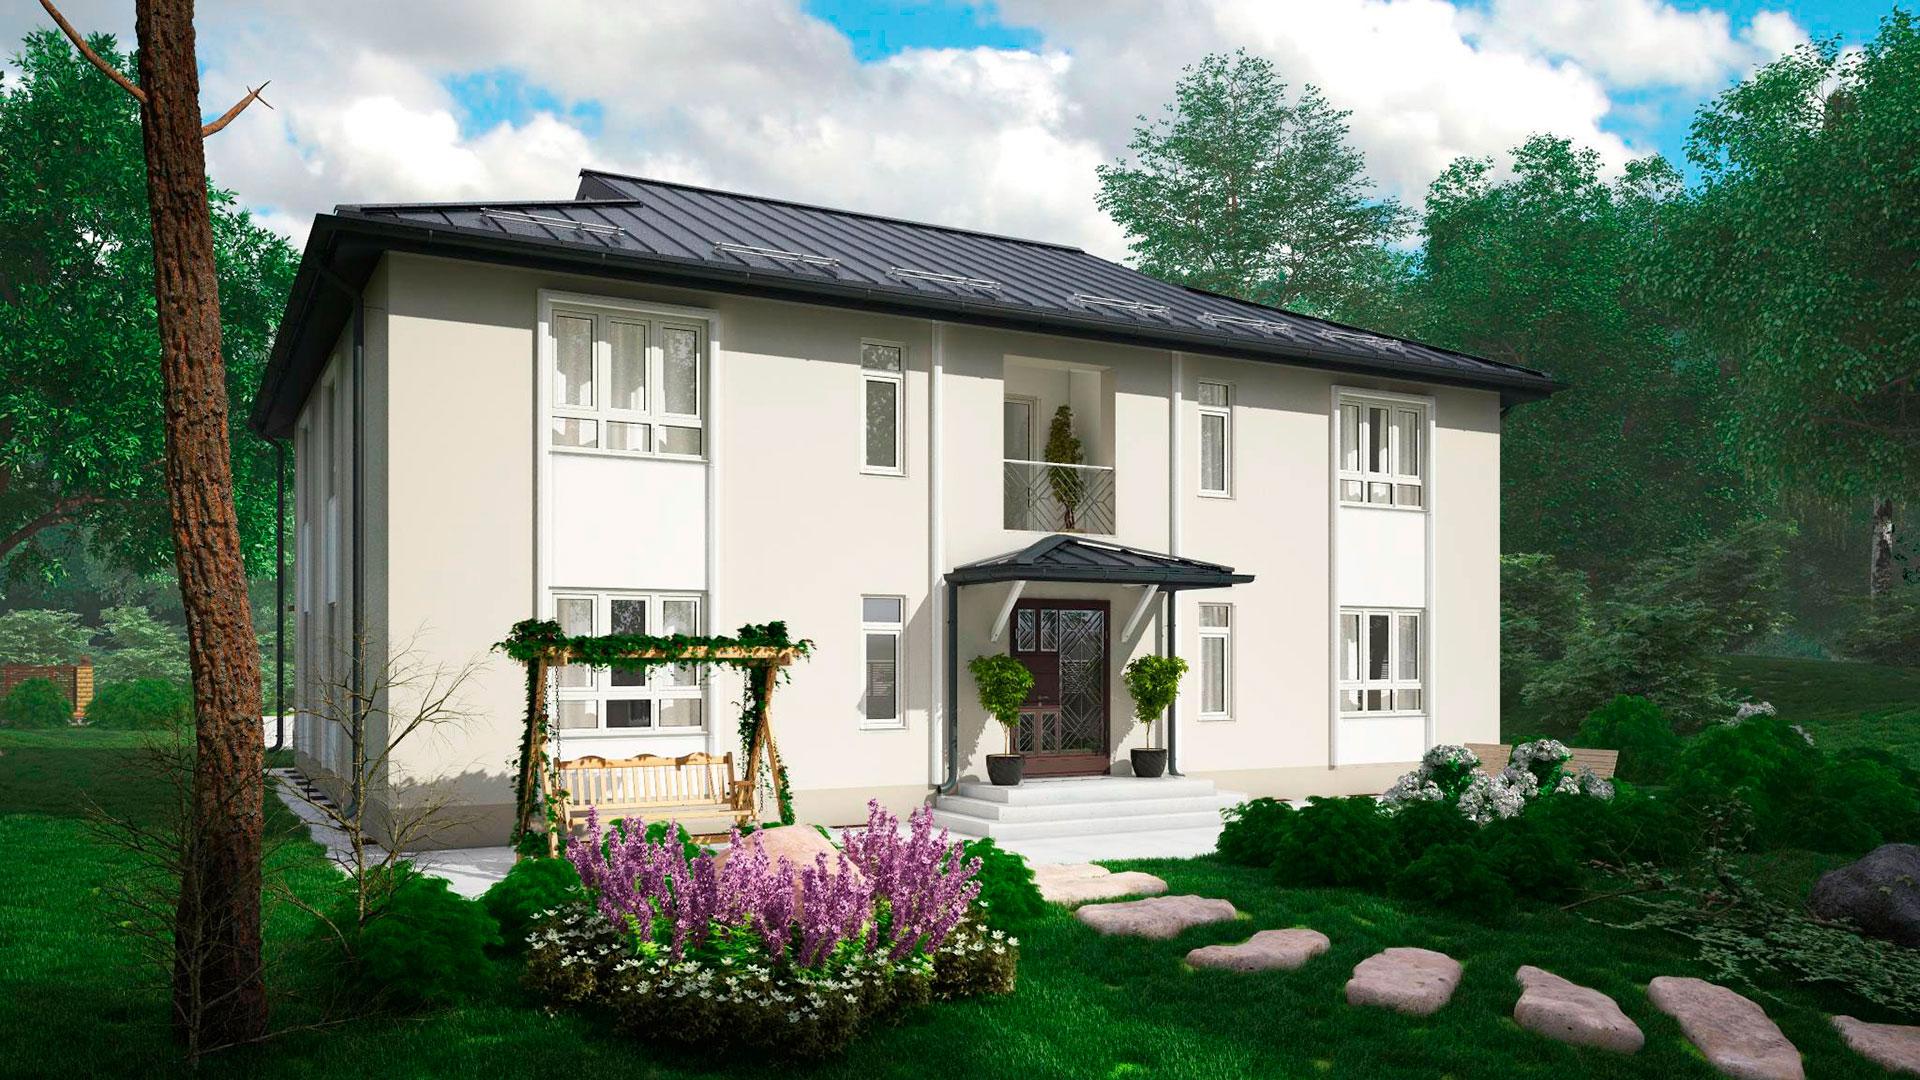 Передний фасад МС-346 - проекта дома на 4 квартиры, двухэтажного, 342,14 м2.